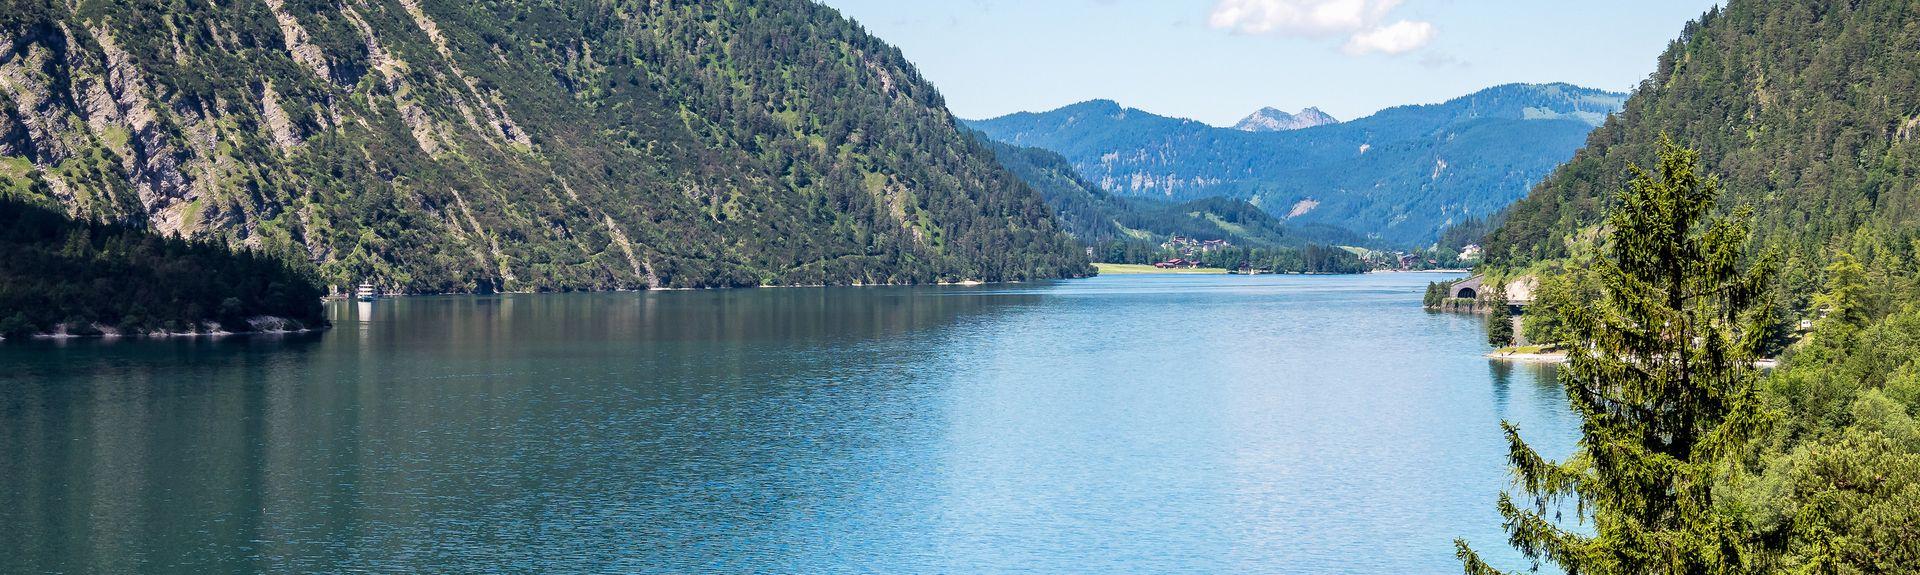 Achen Lake, Austria